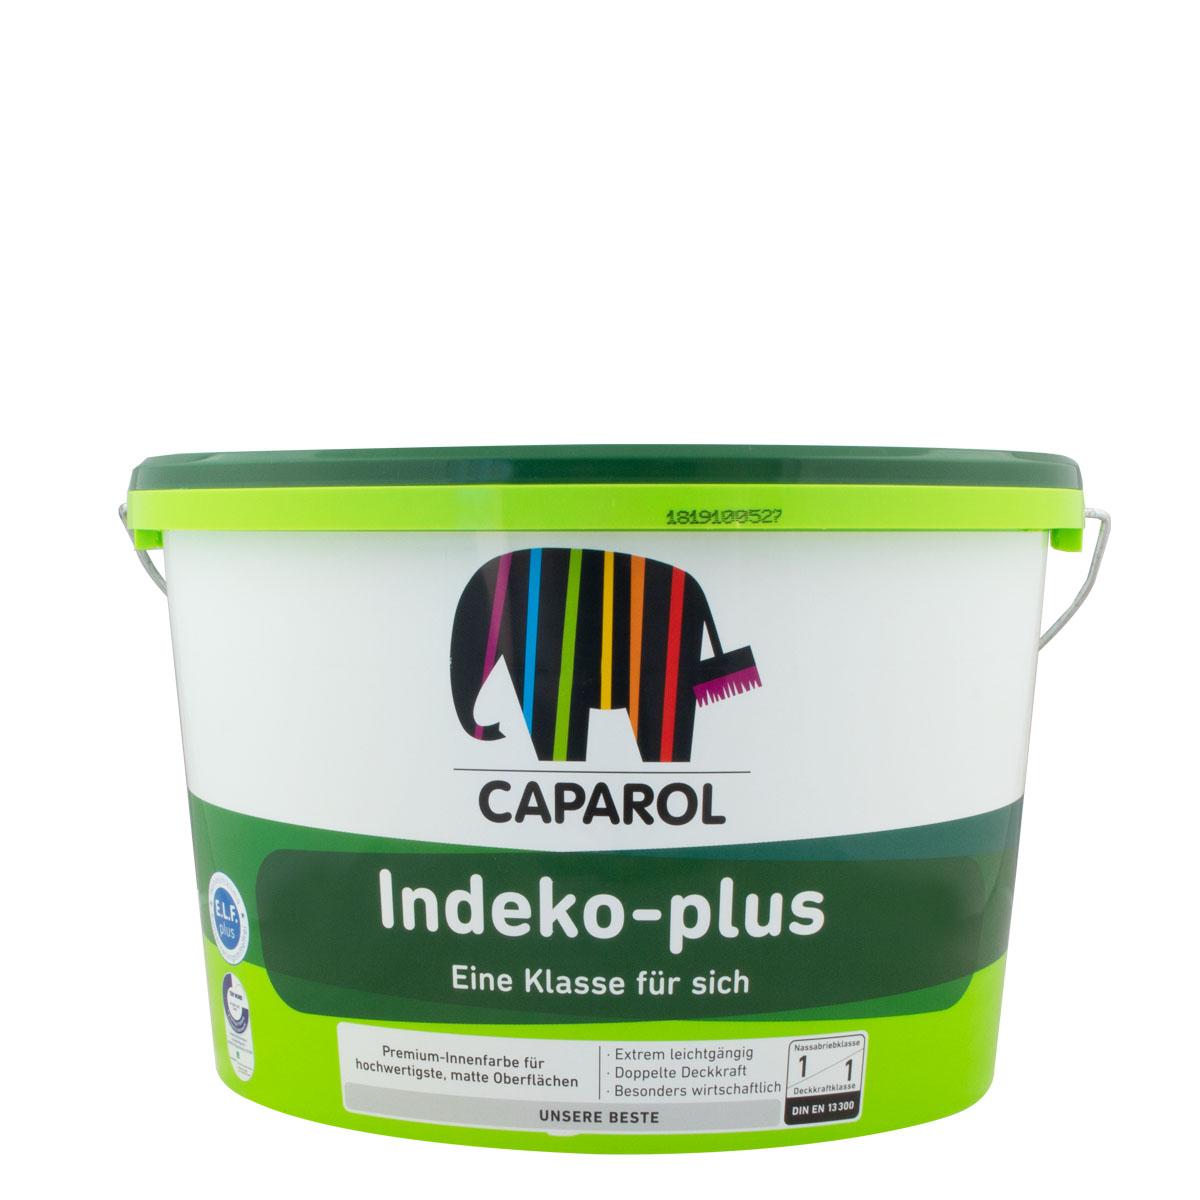 Caparol Indeko Plus 12,5L MIX PG B, HBW <40, premium Innenfarbe, hochdeckend